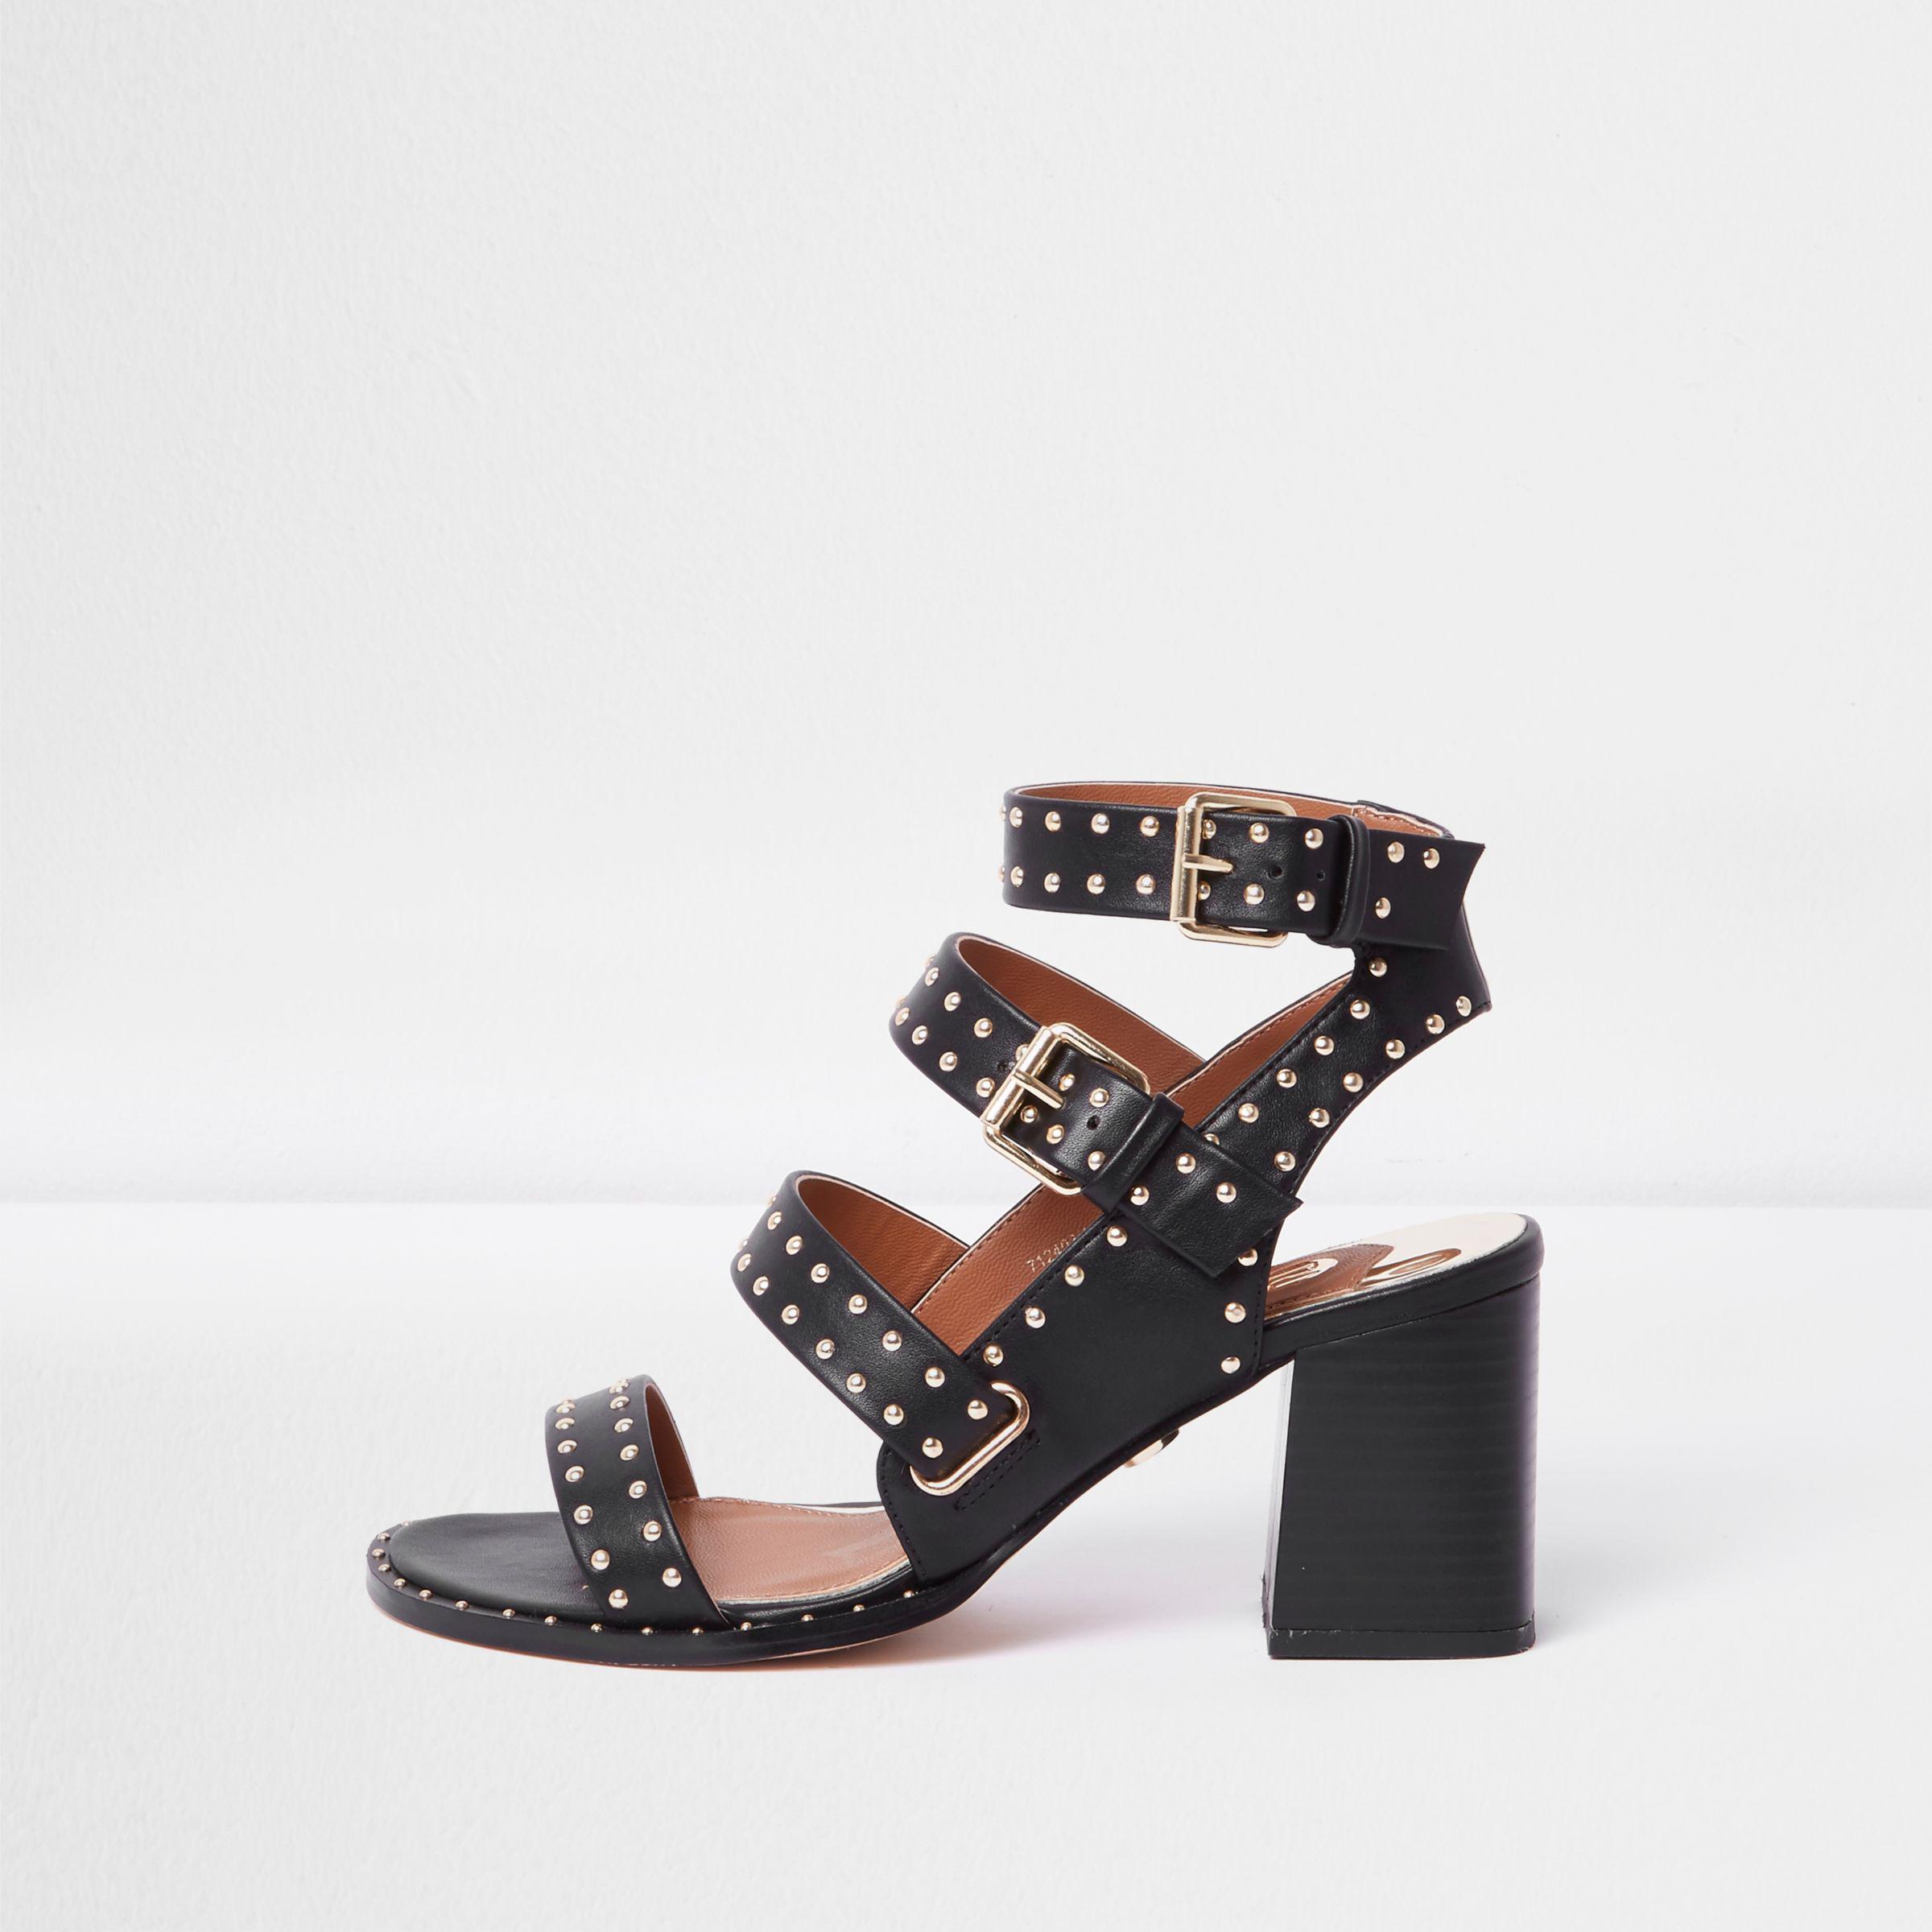 787e9390a0b2 River Island Black Studded Strappy Block Heel Sandals in Black - Lyst